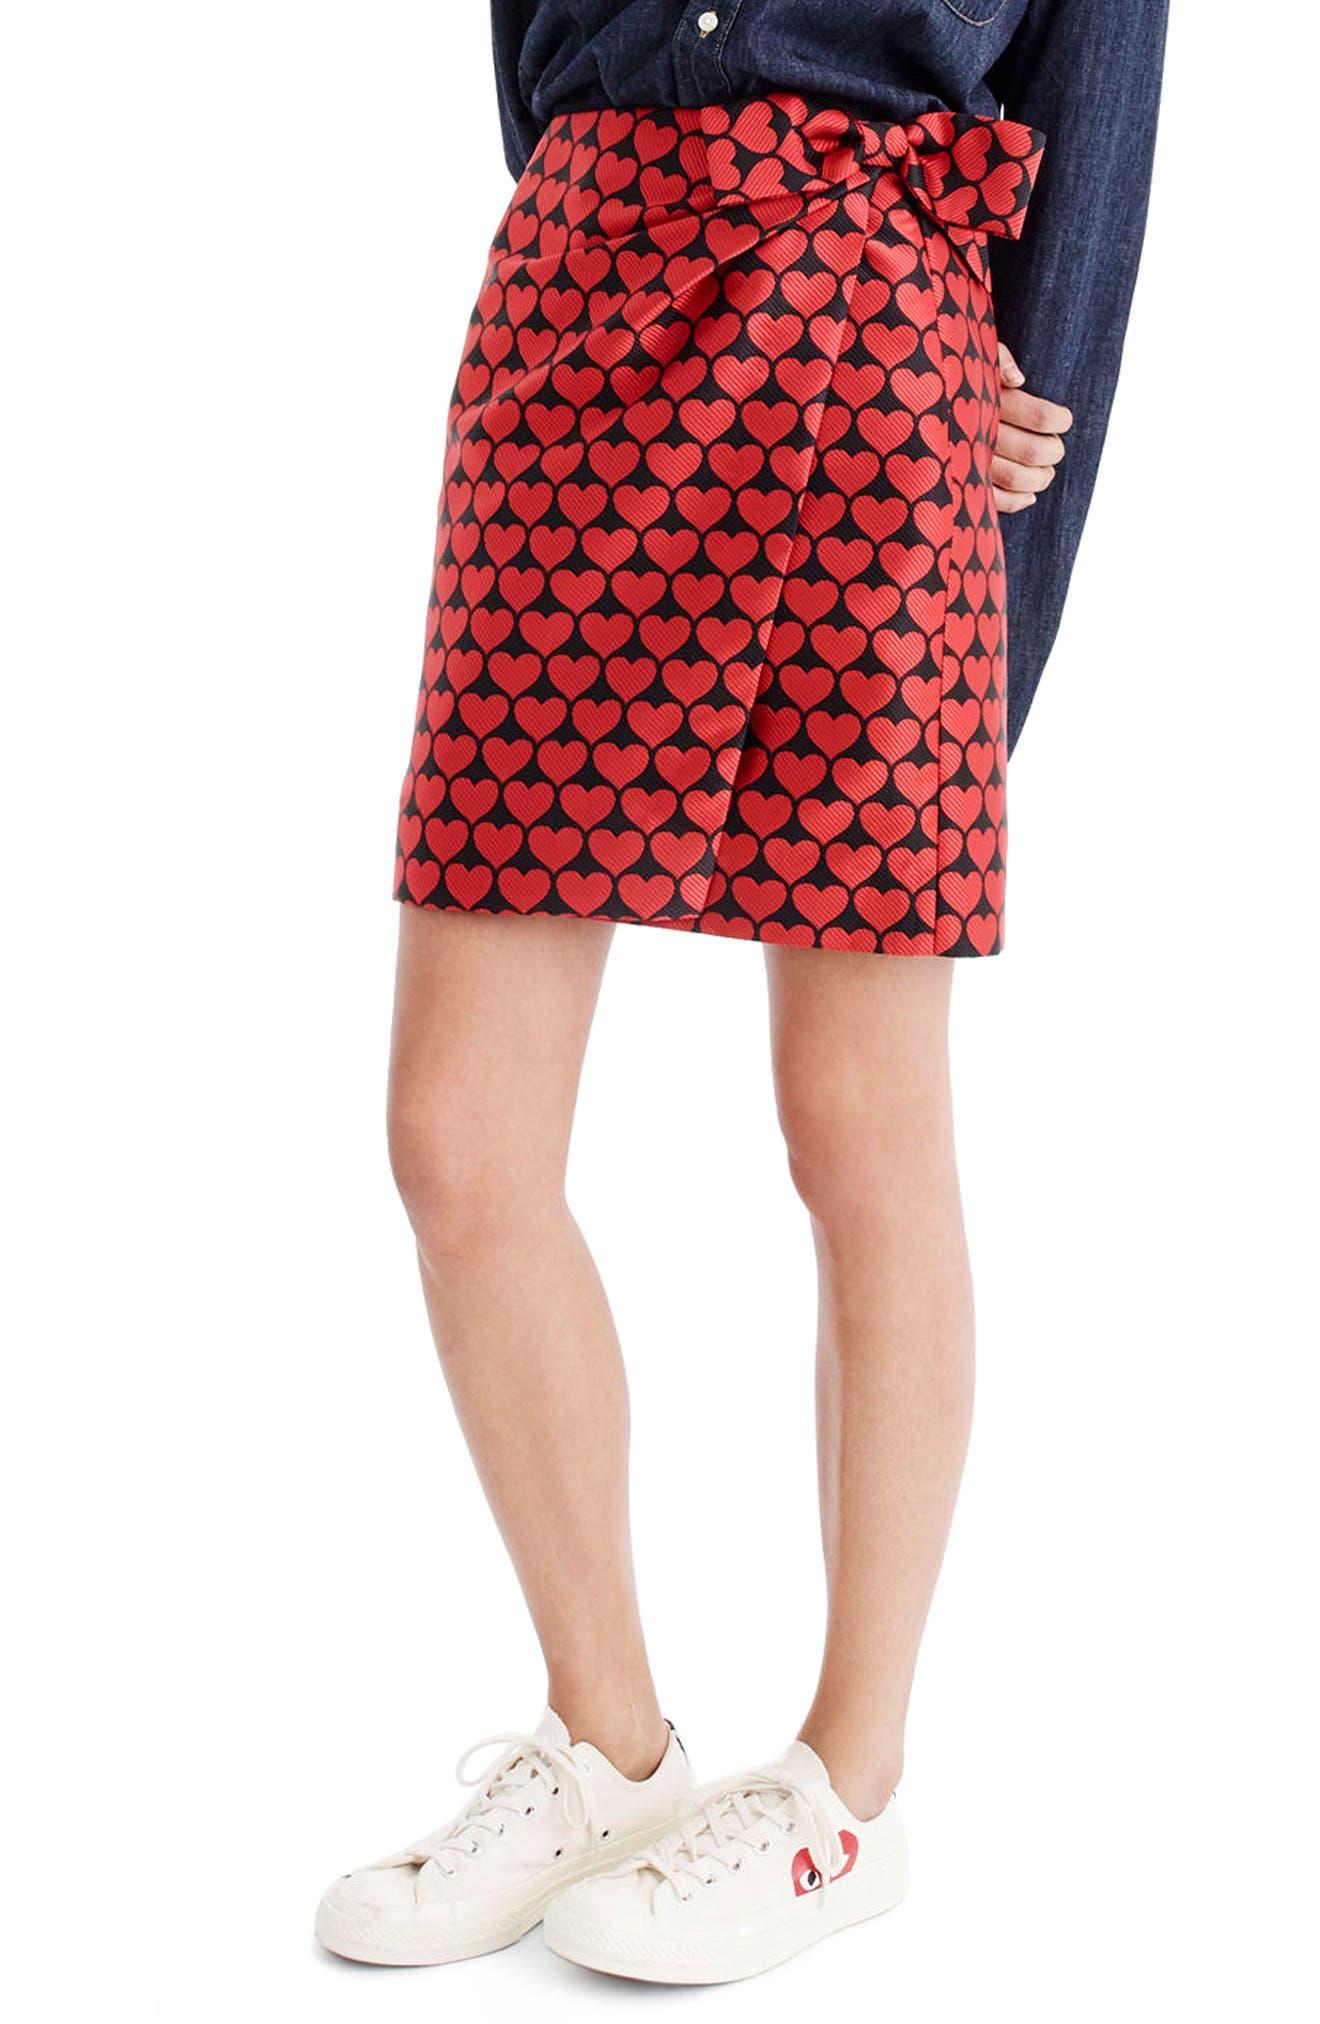 J.Crew Castlebar Snuggle Heart Skirt,                         Main,                         color, Electric Red